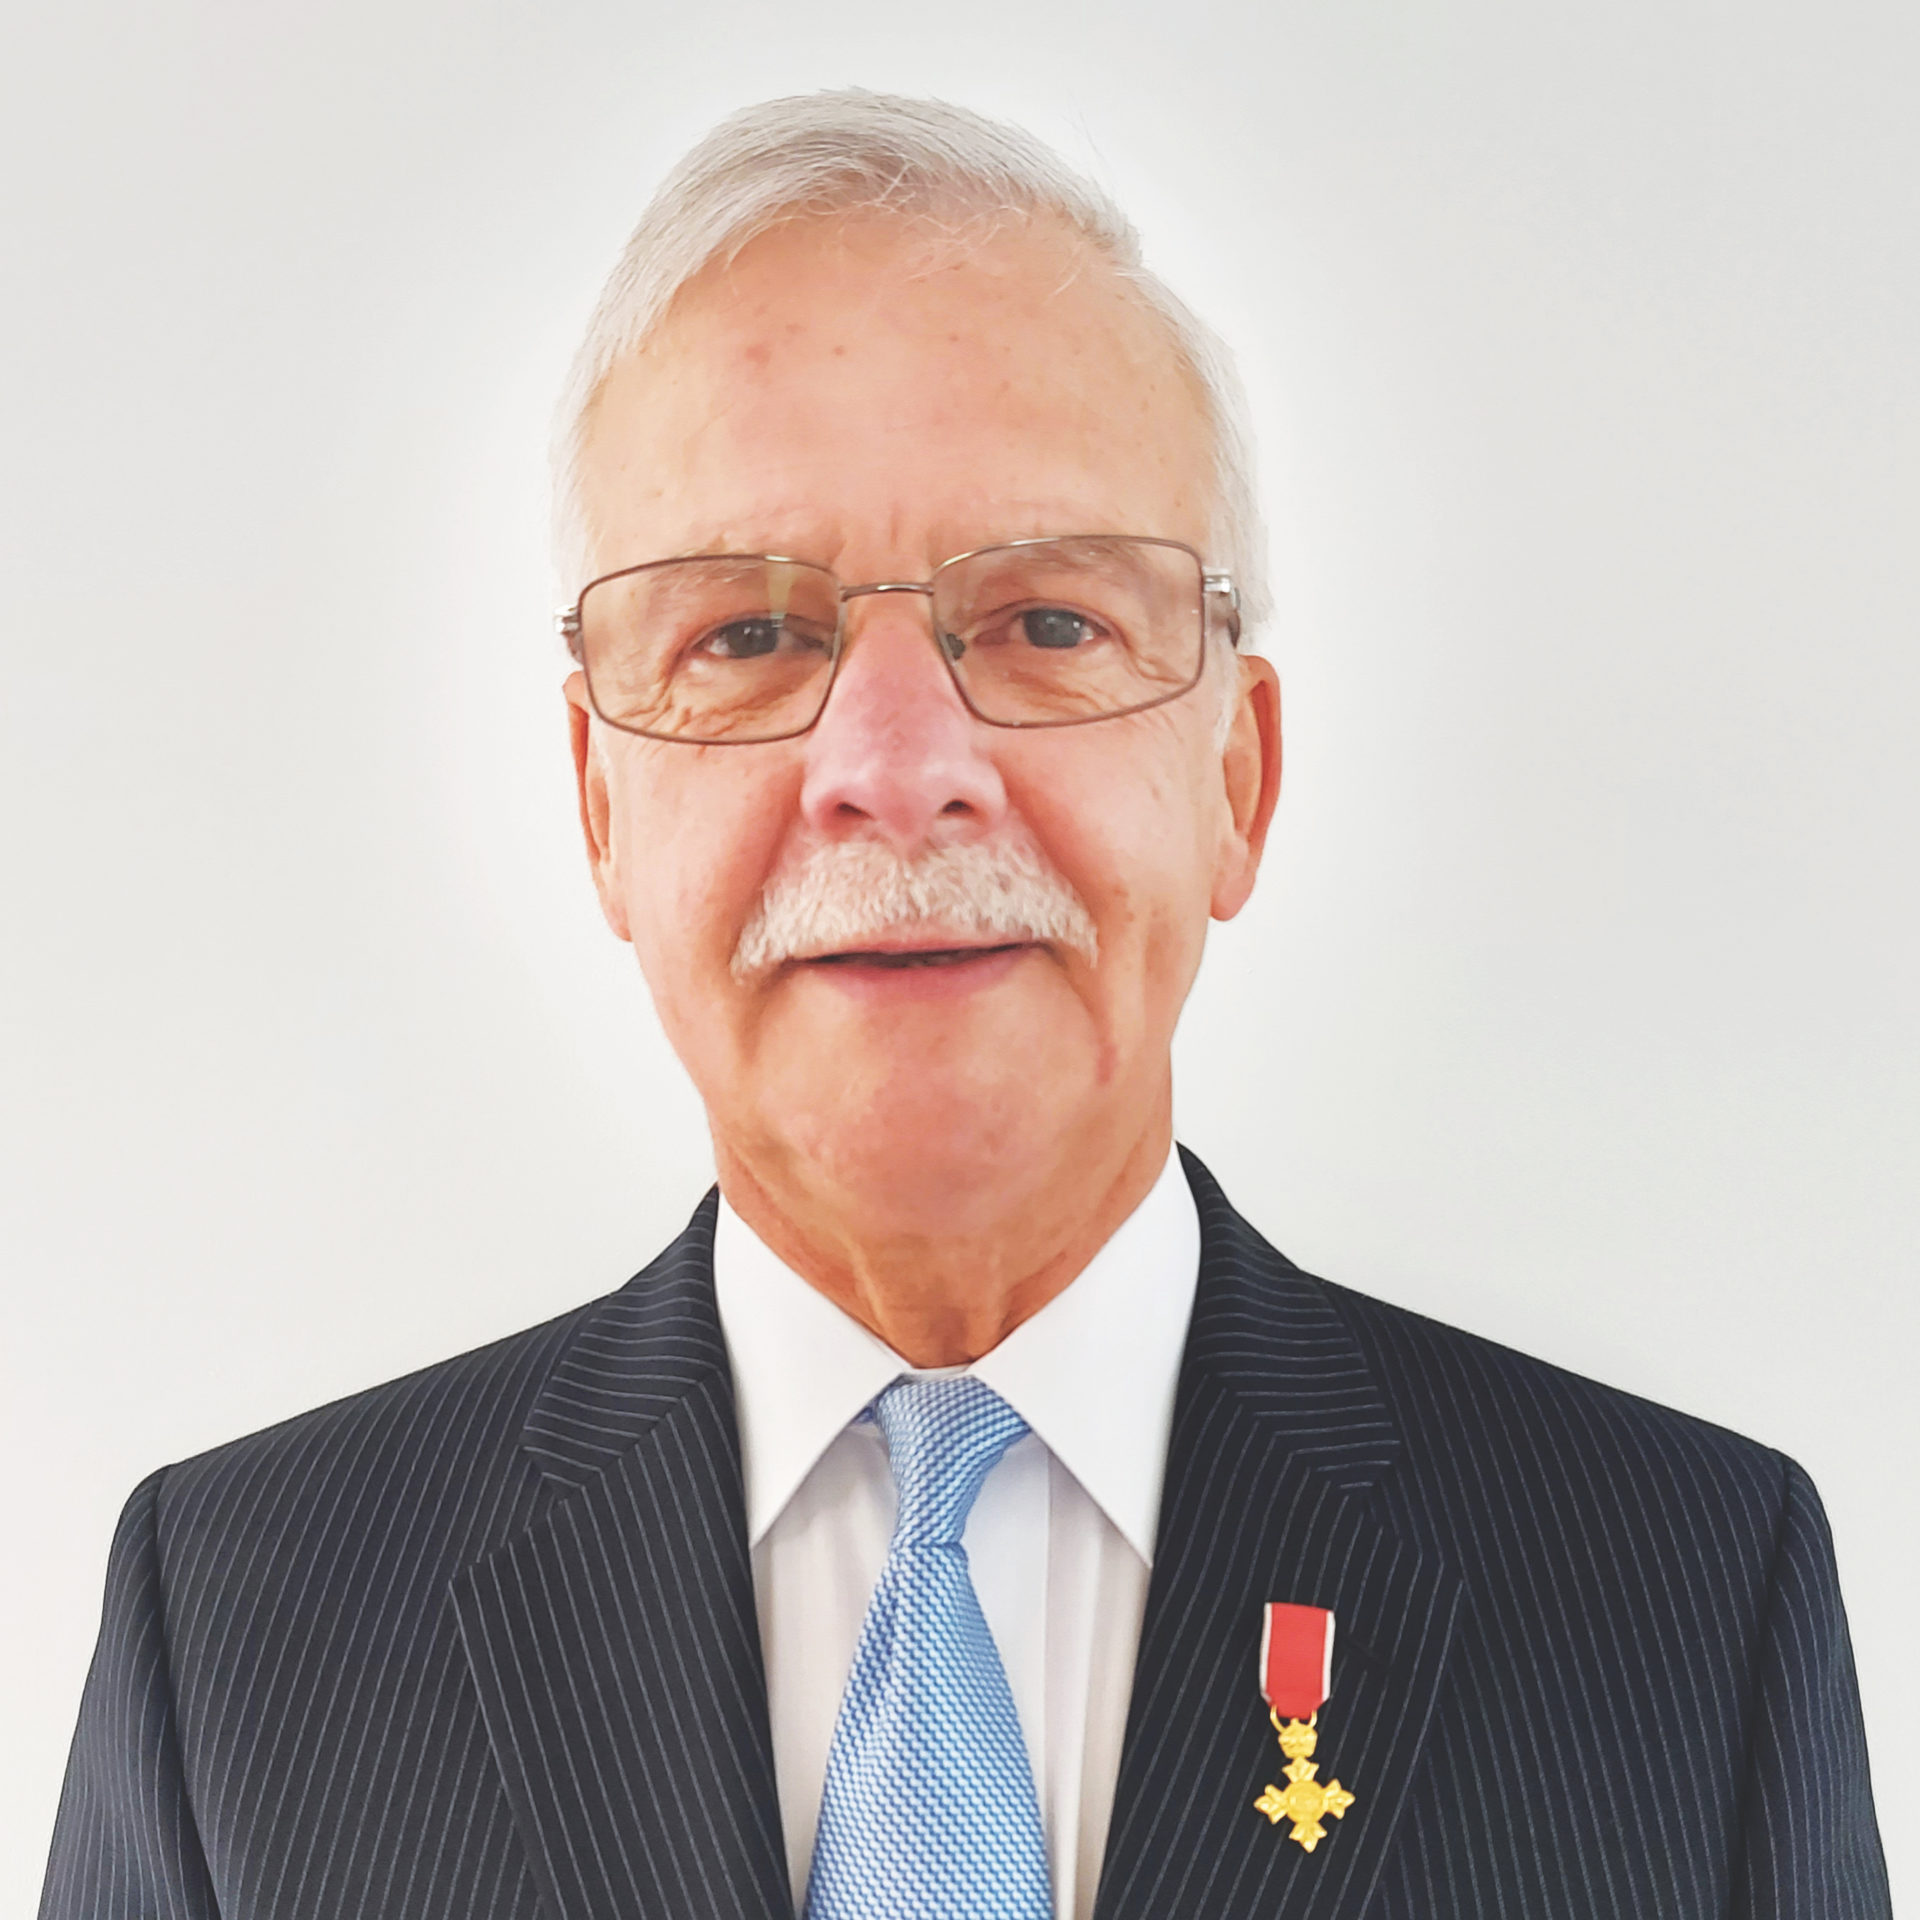 Mike Foy, CIOB president